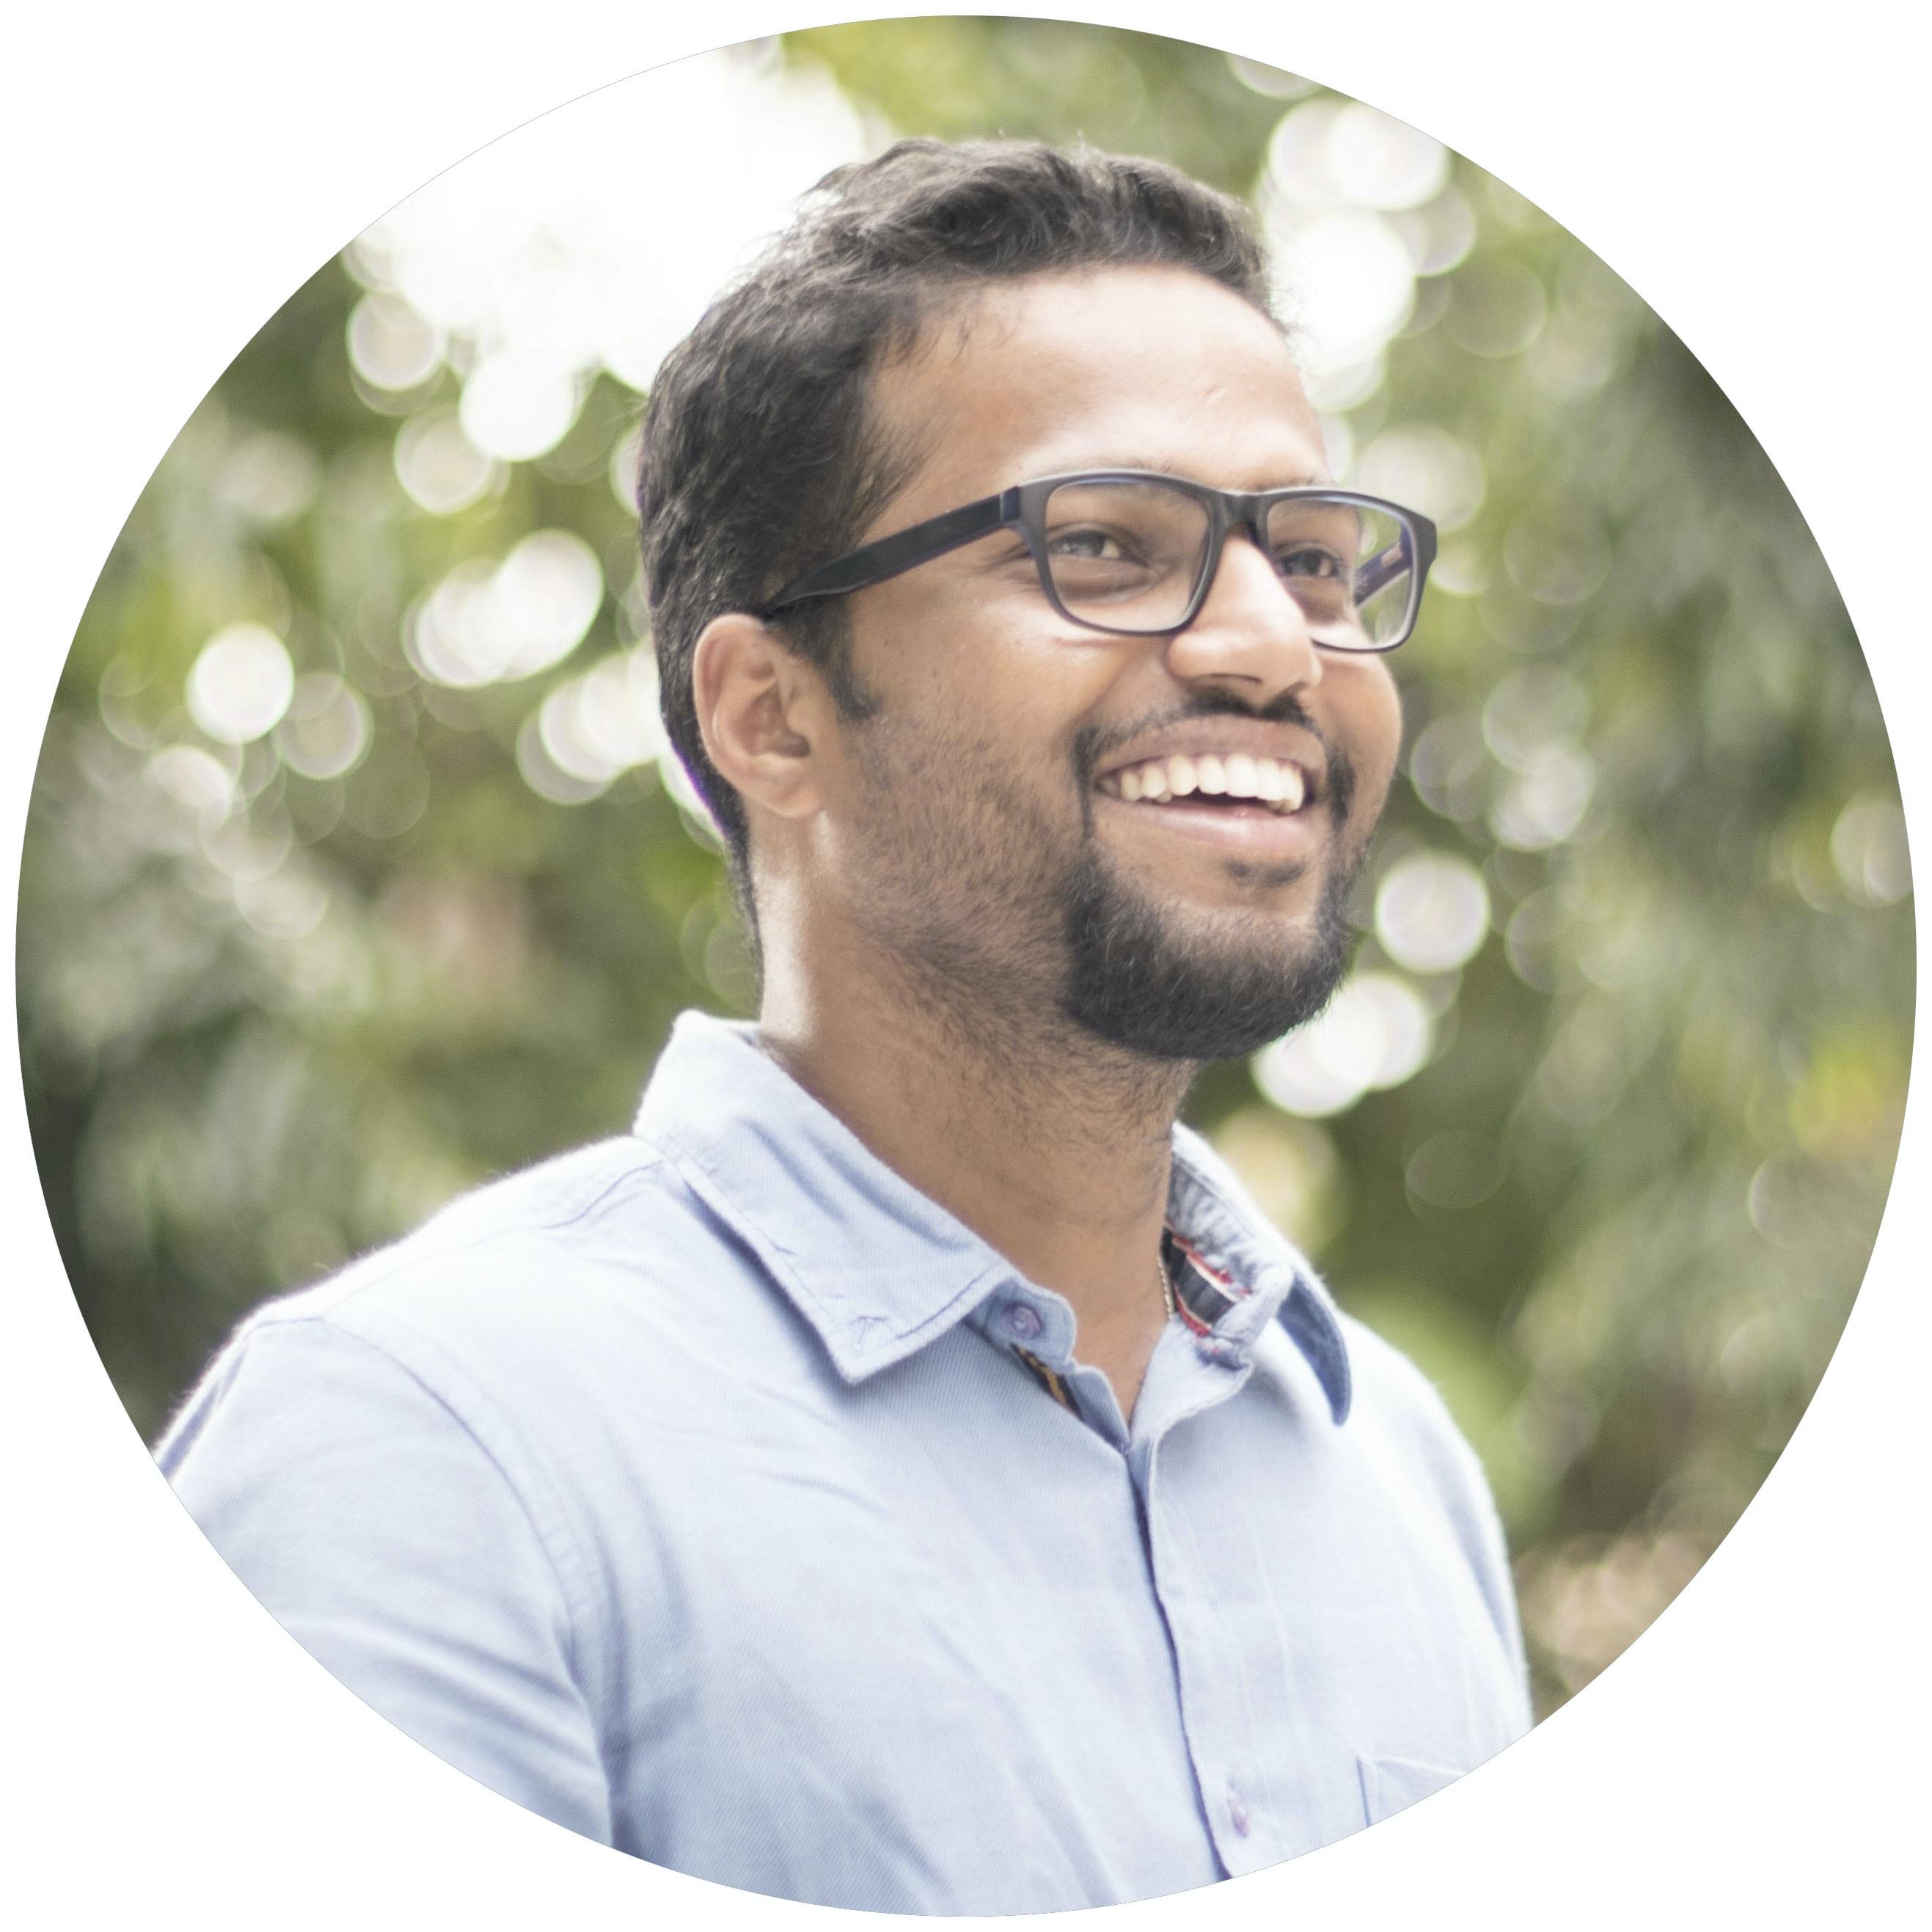 Avatar of user Thoshith Ravi